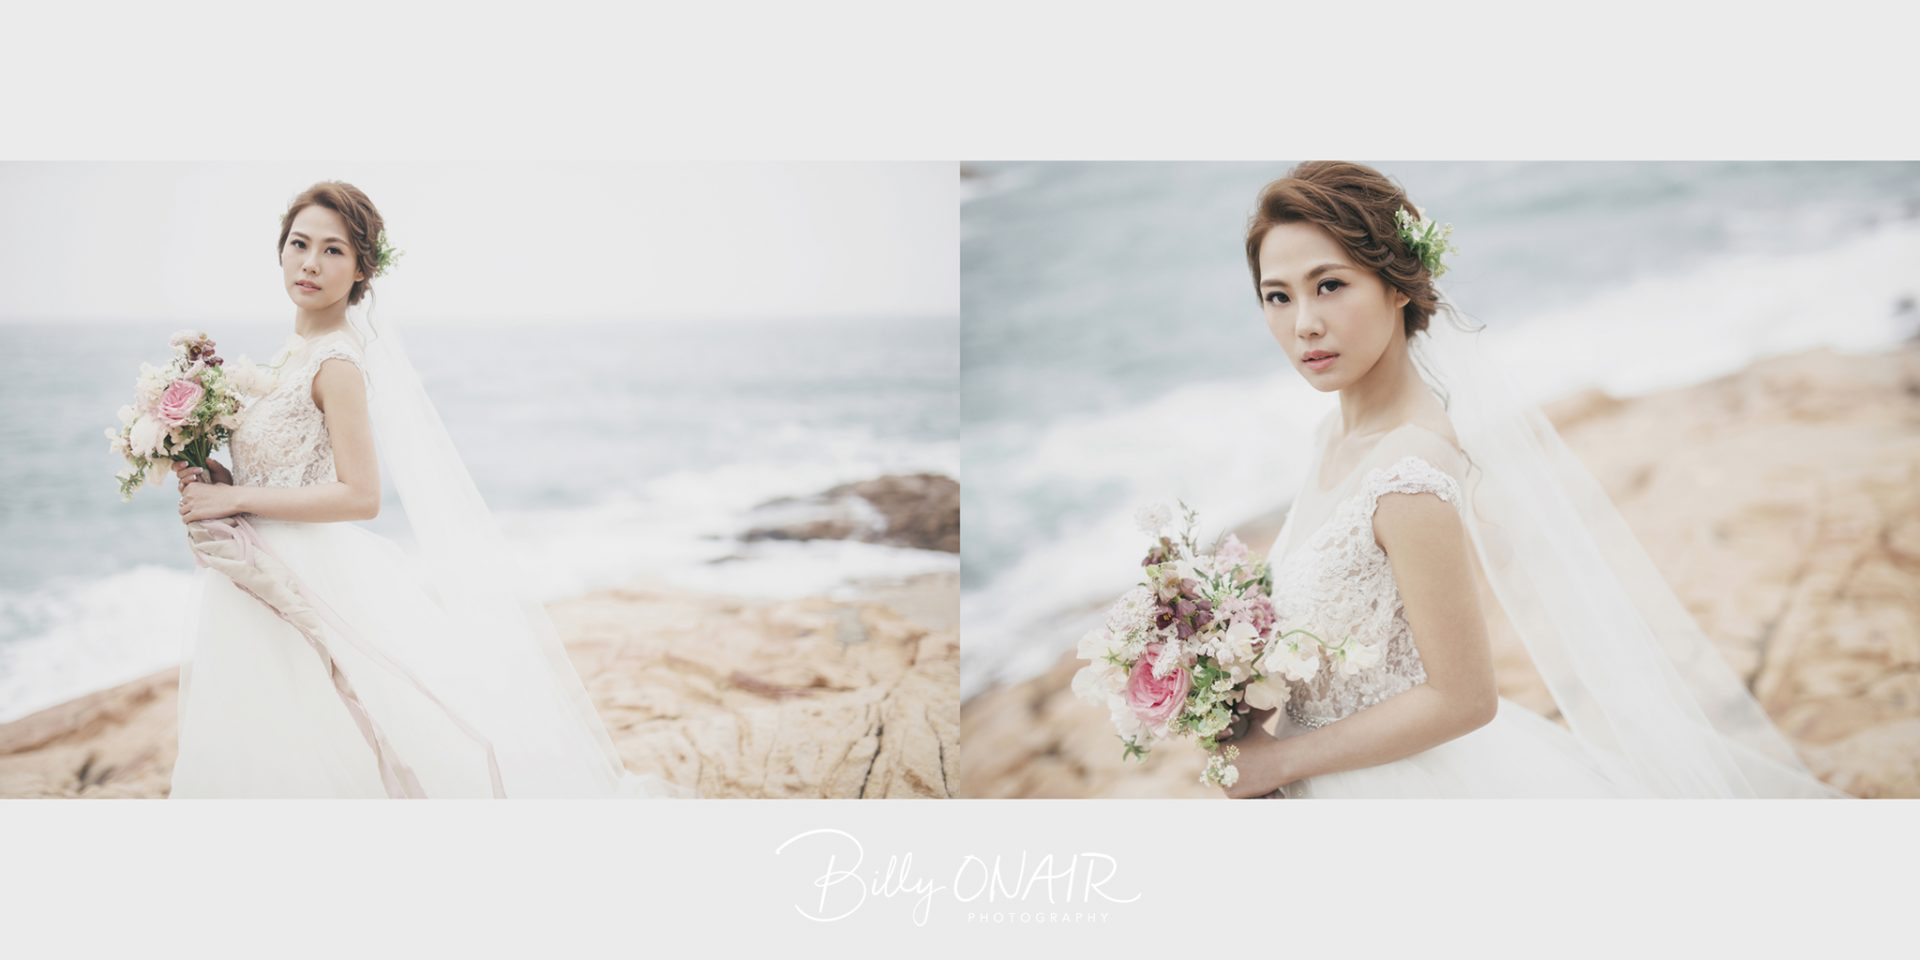 hk_pre_wedding_13